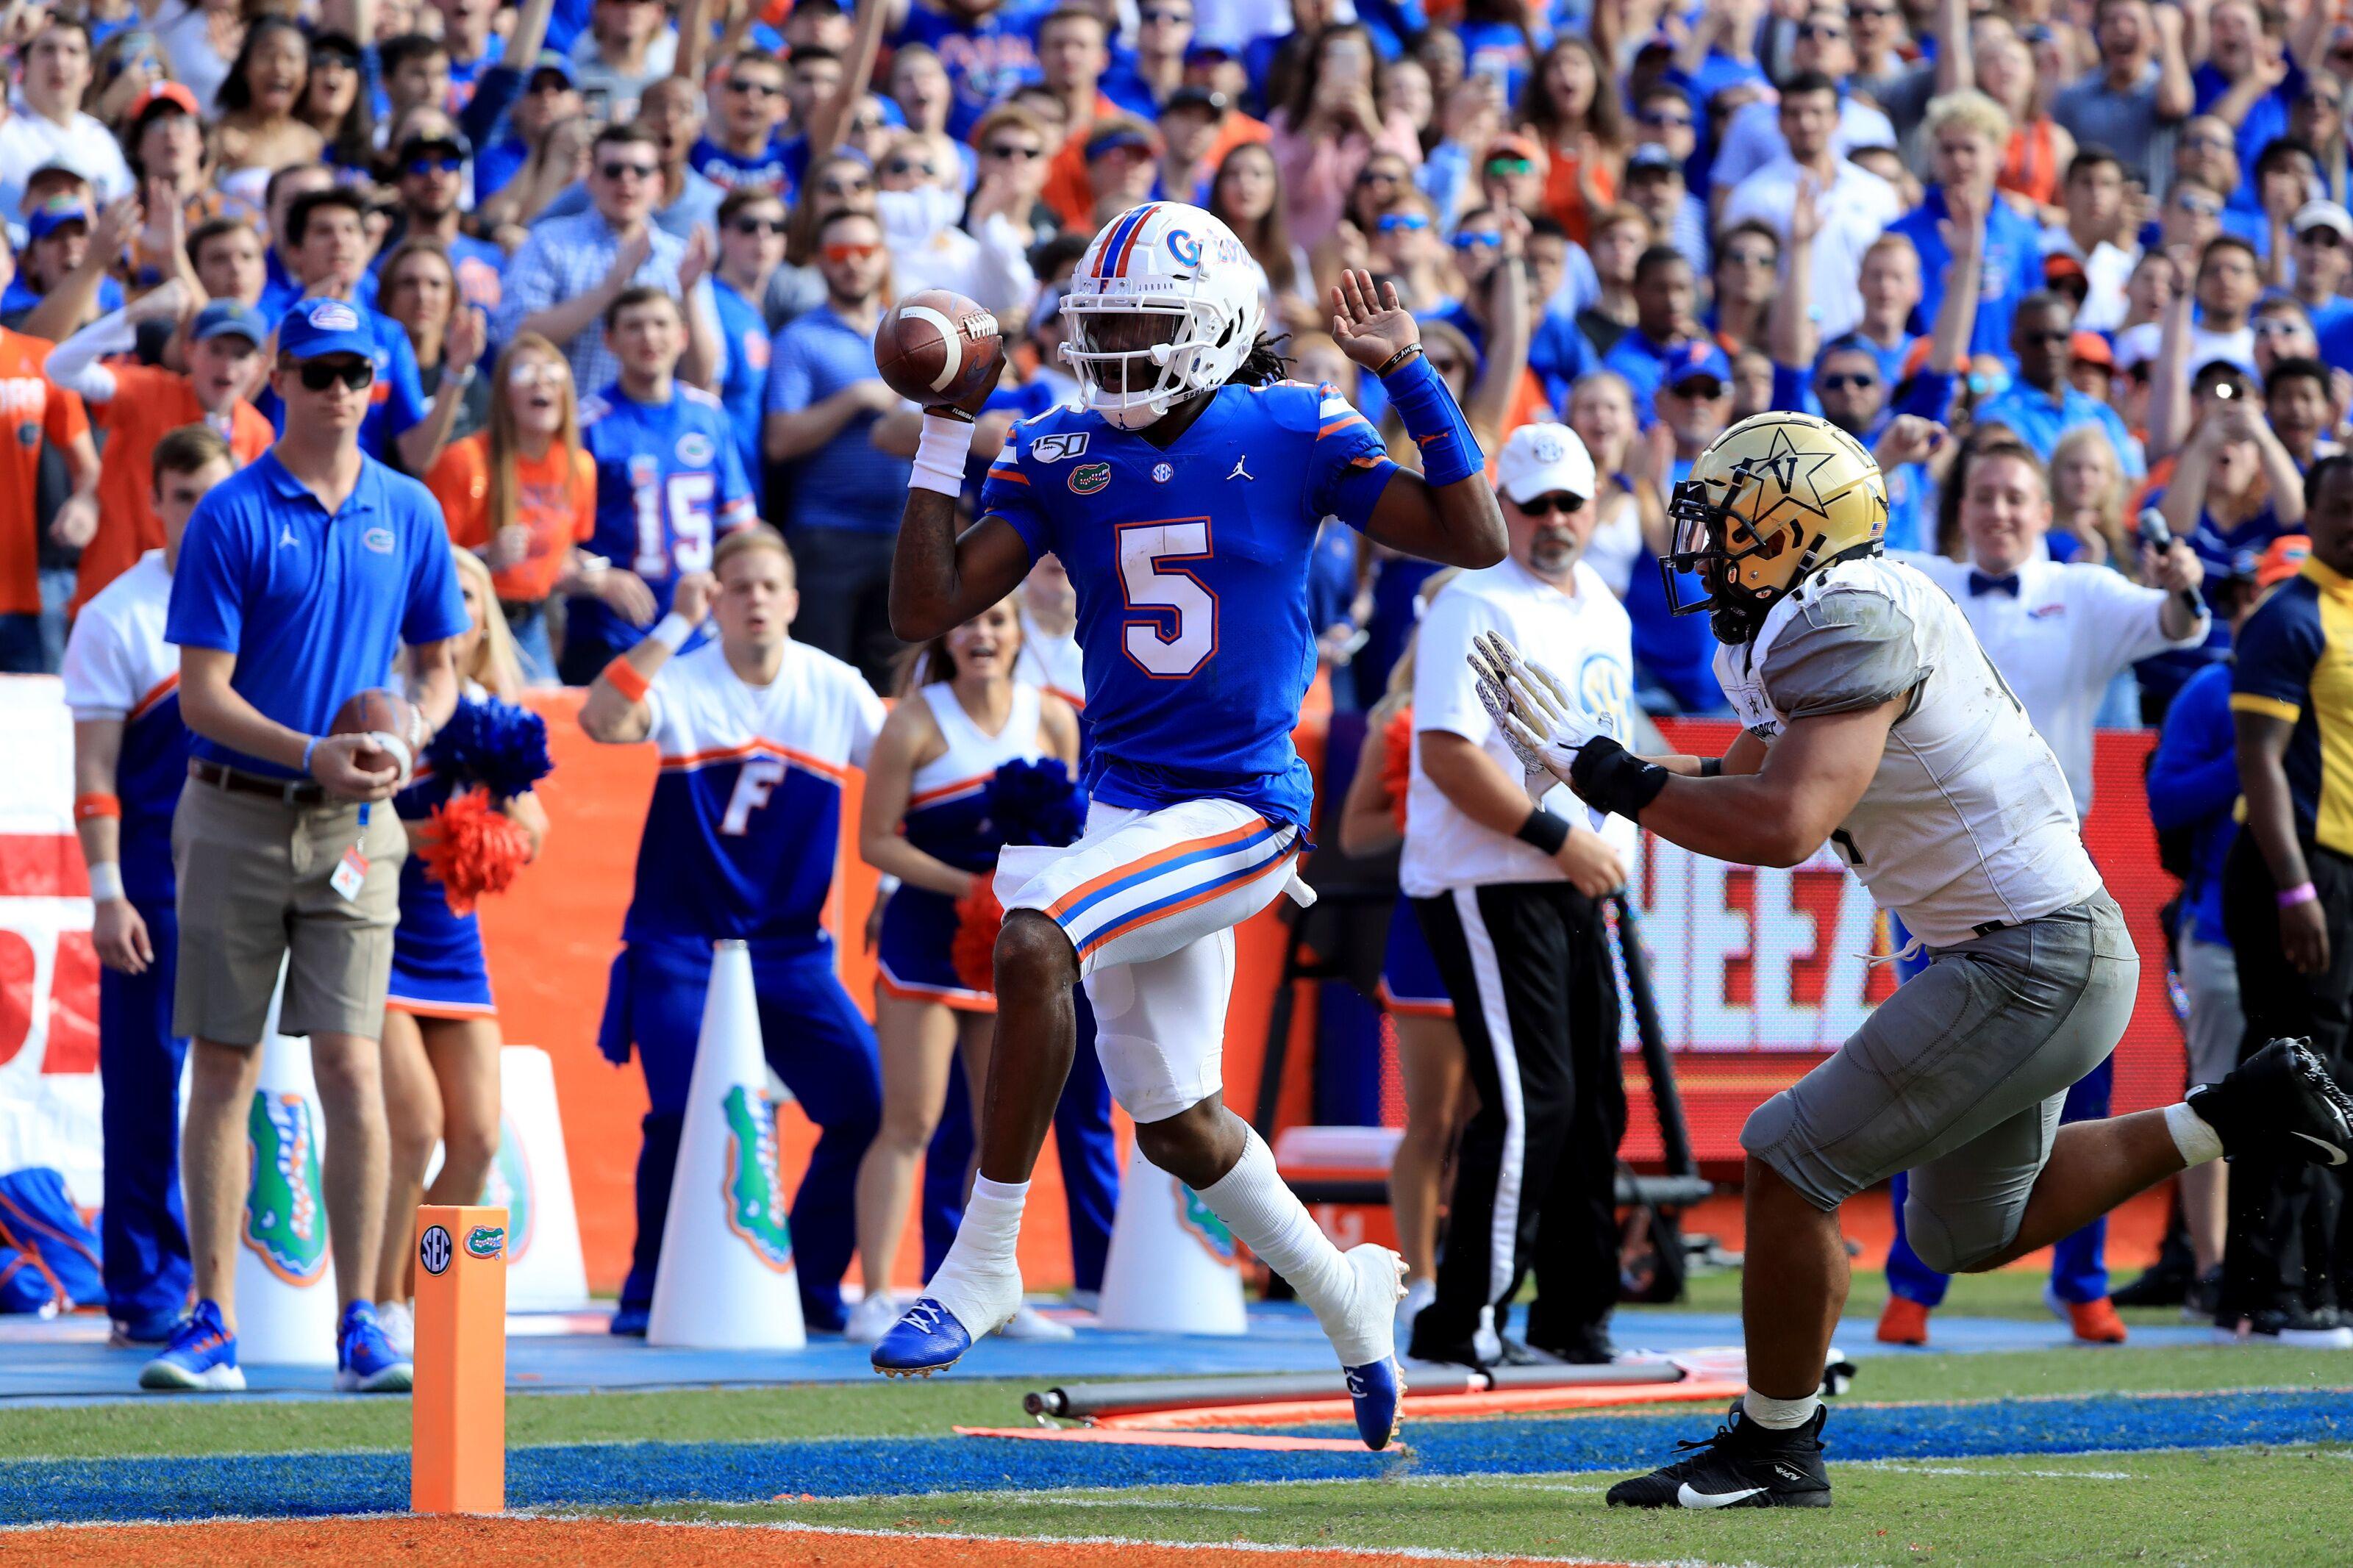 Florida football: Week 11 in the SEC, in one sentence